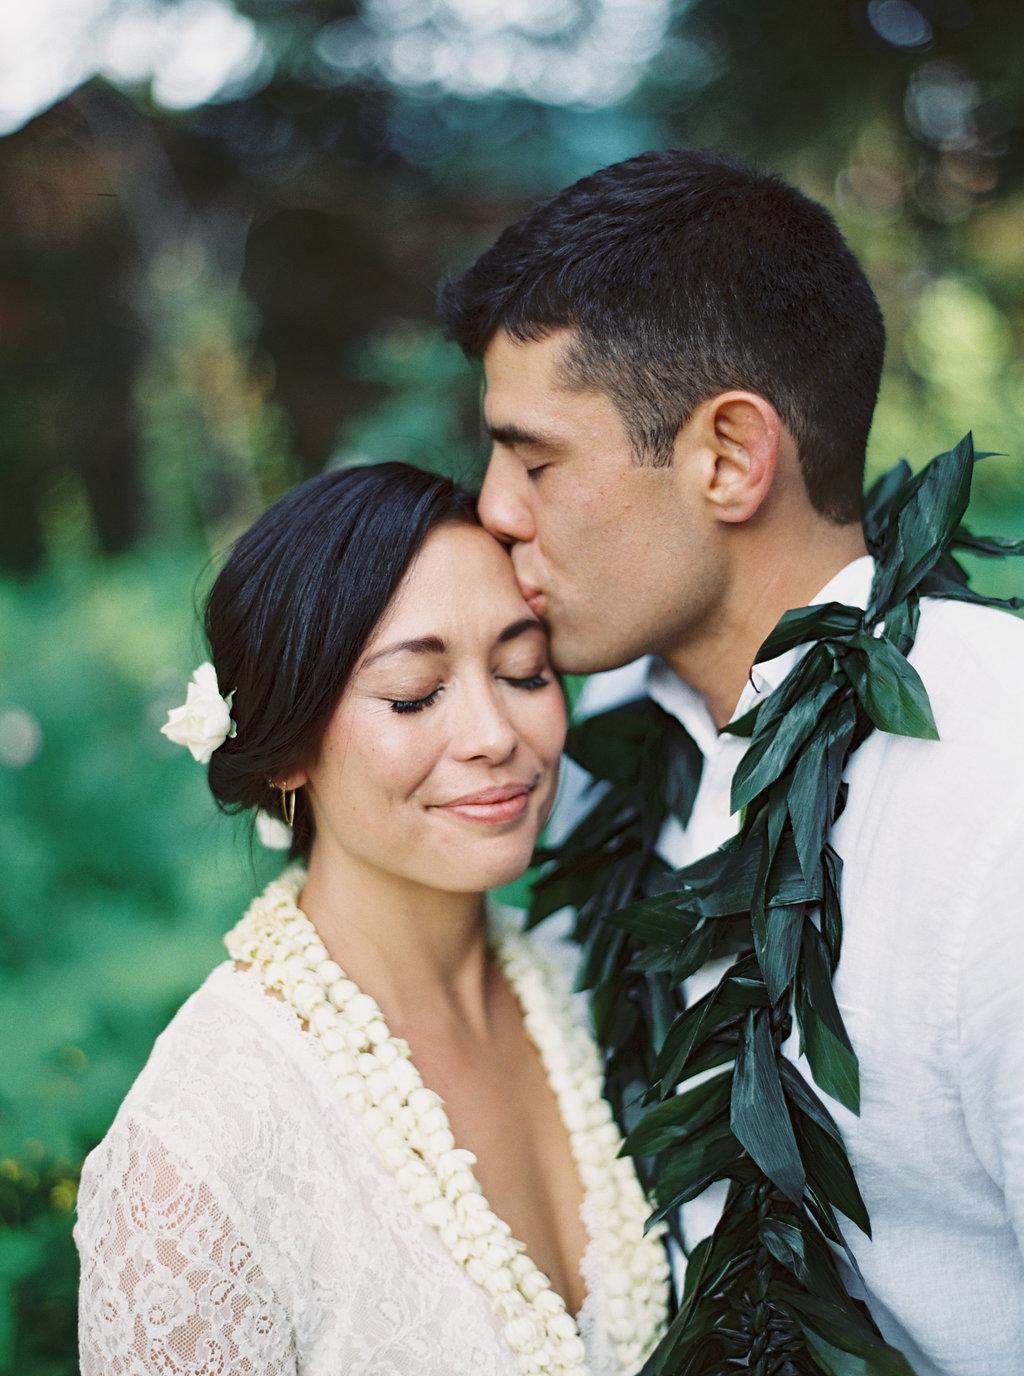 000030_gallardo_wedding_film0100.jpg